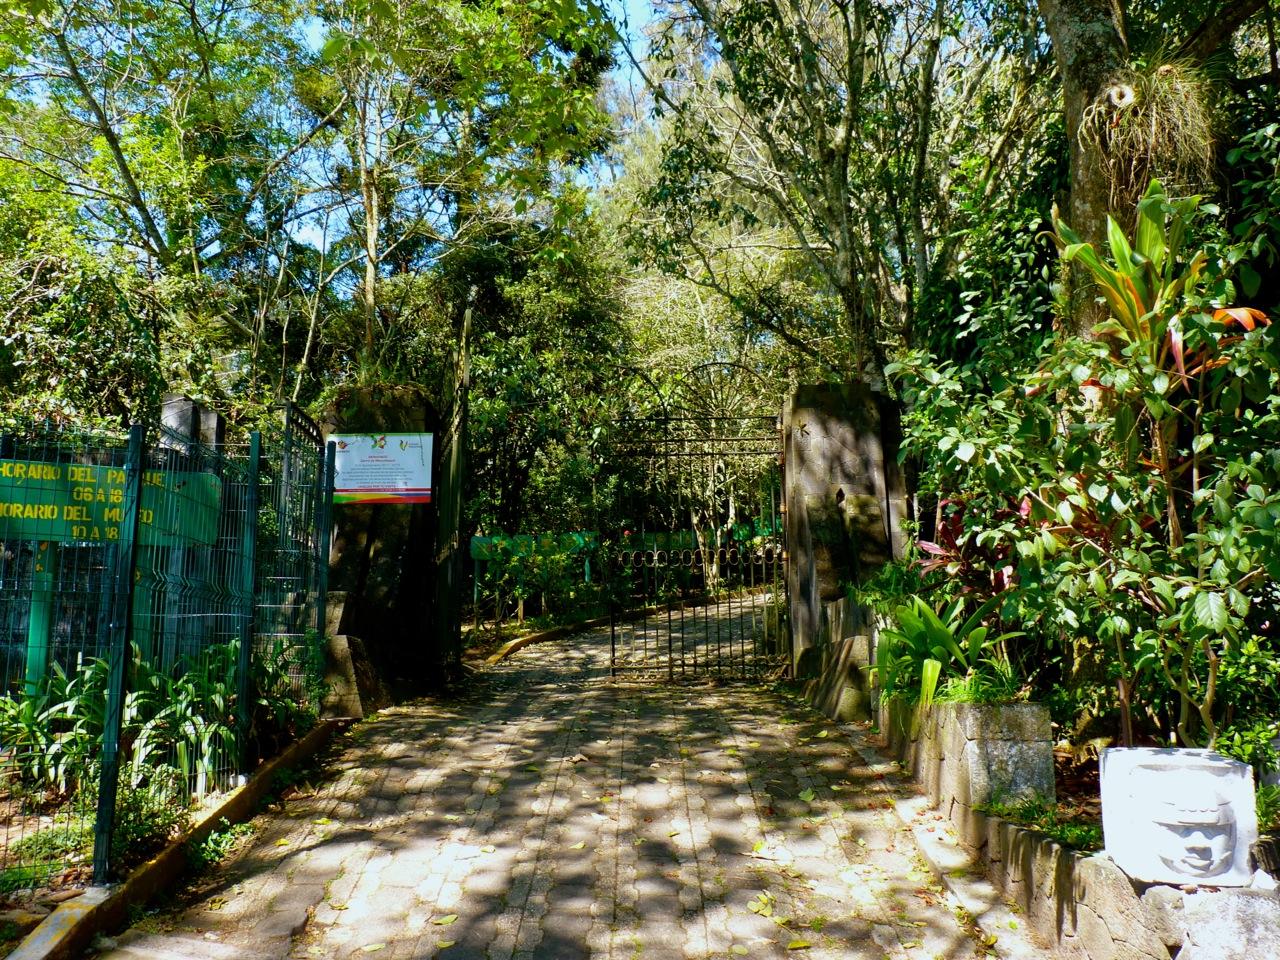 Parque Macuiltepetl.